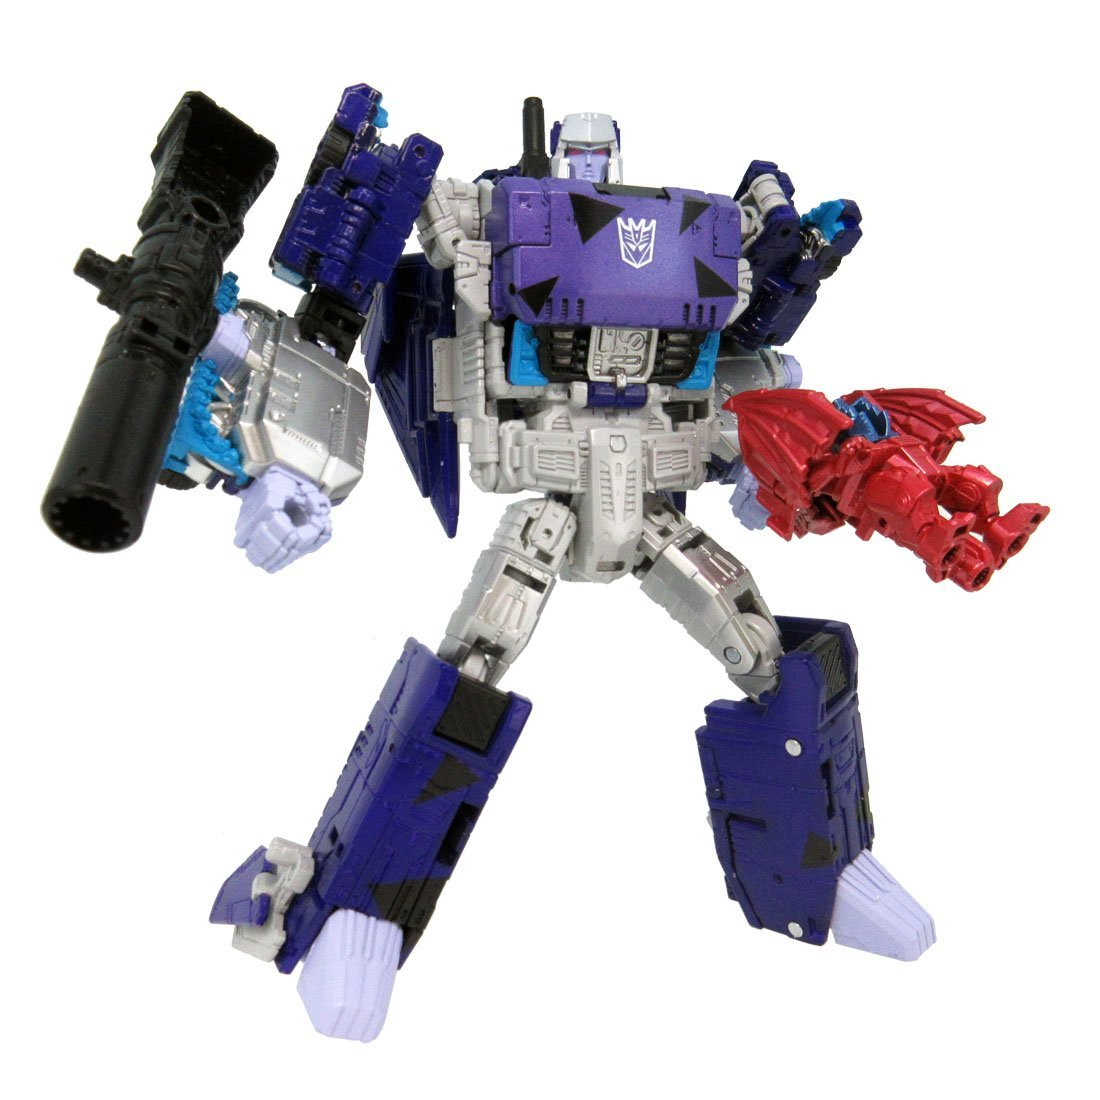 Megatron (Generation 2) - Transformers Toys - TFW2005